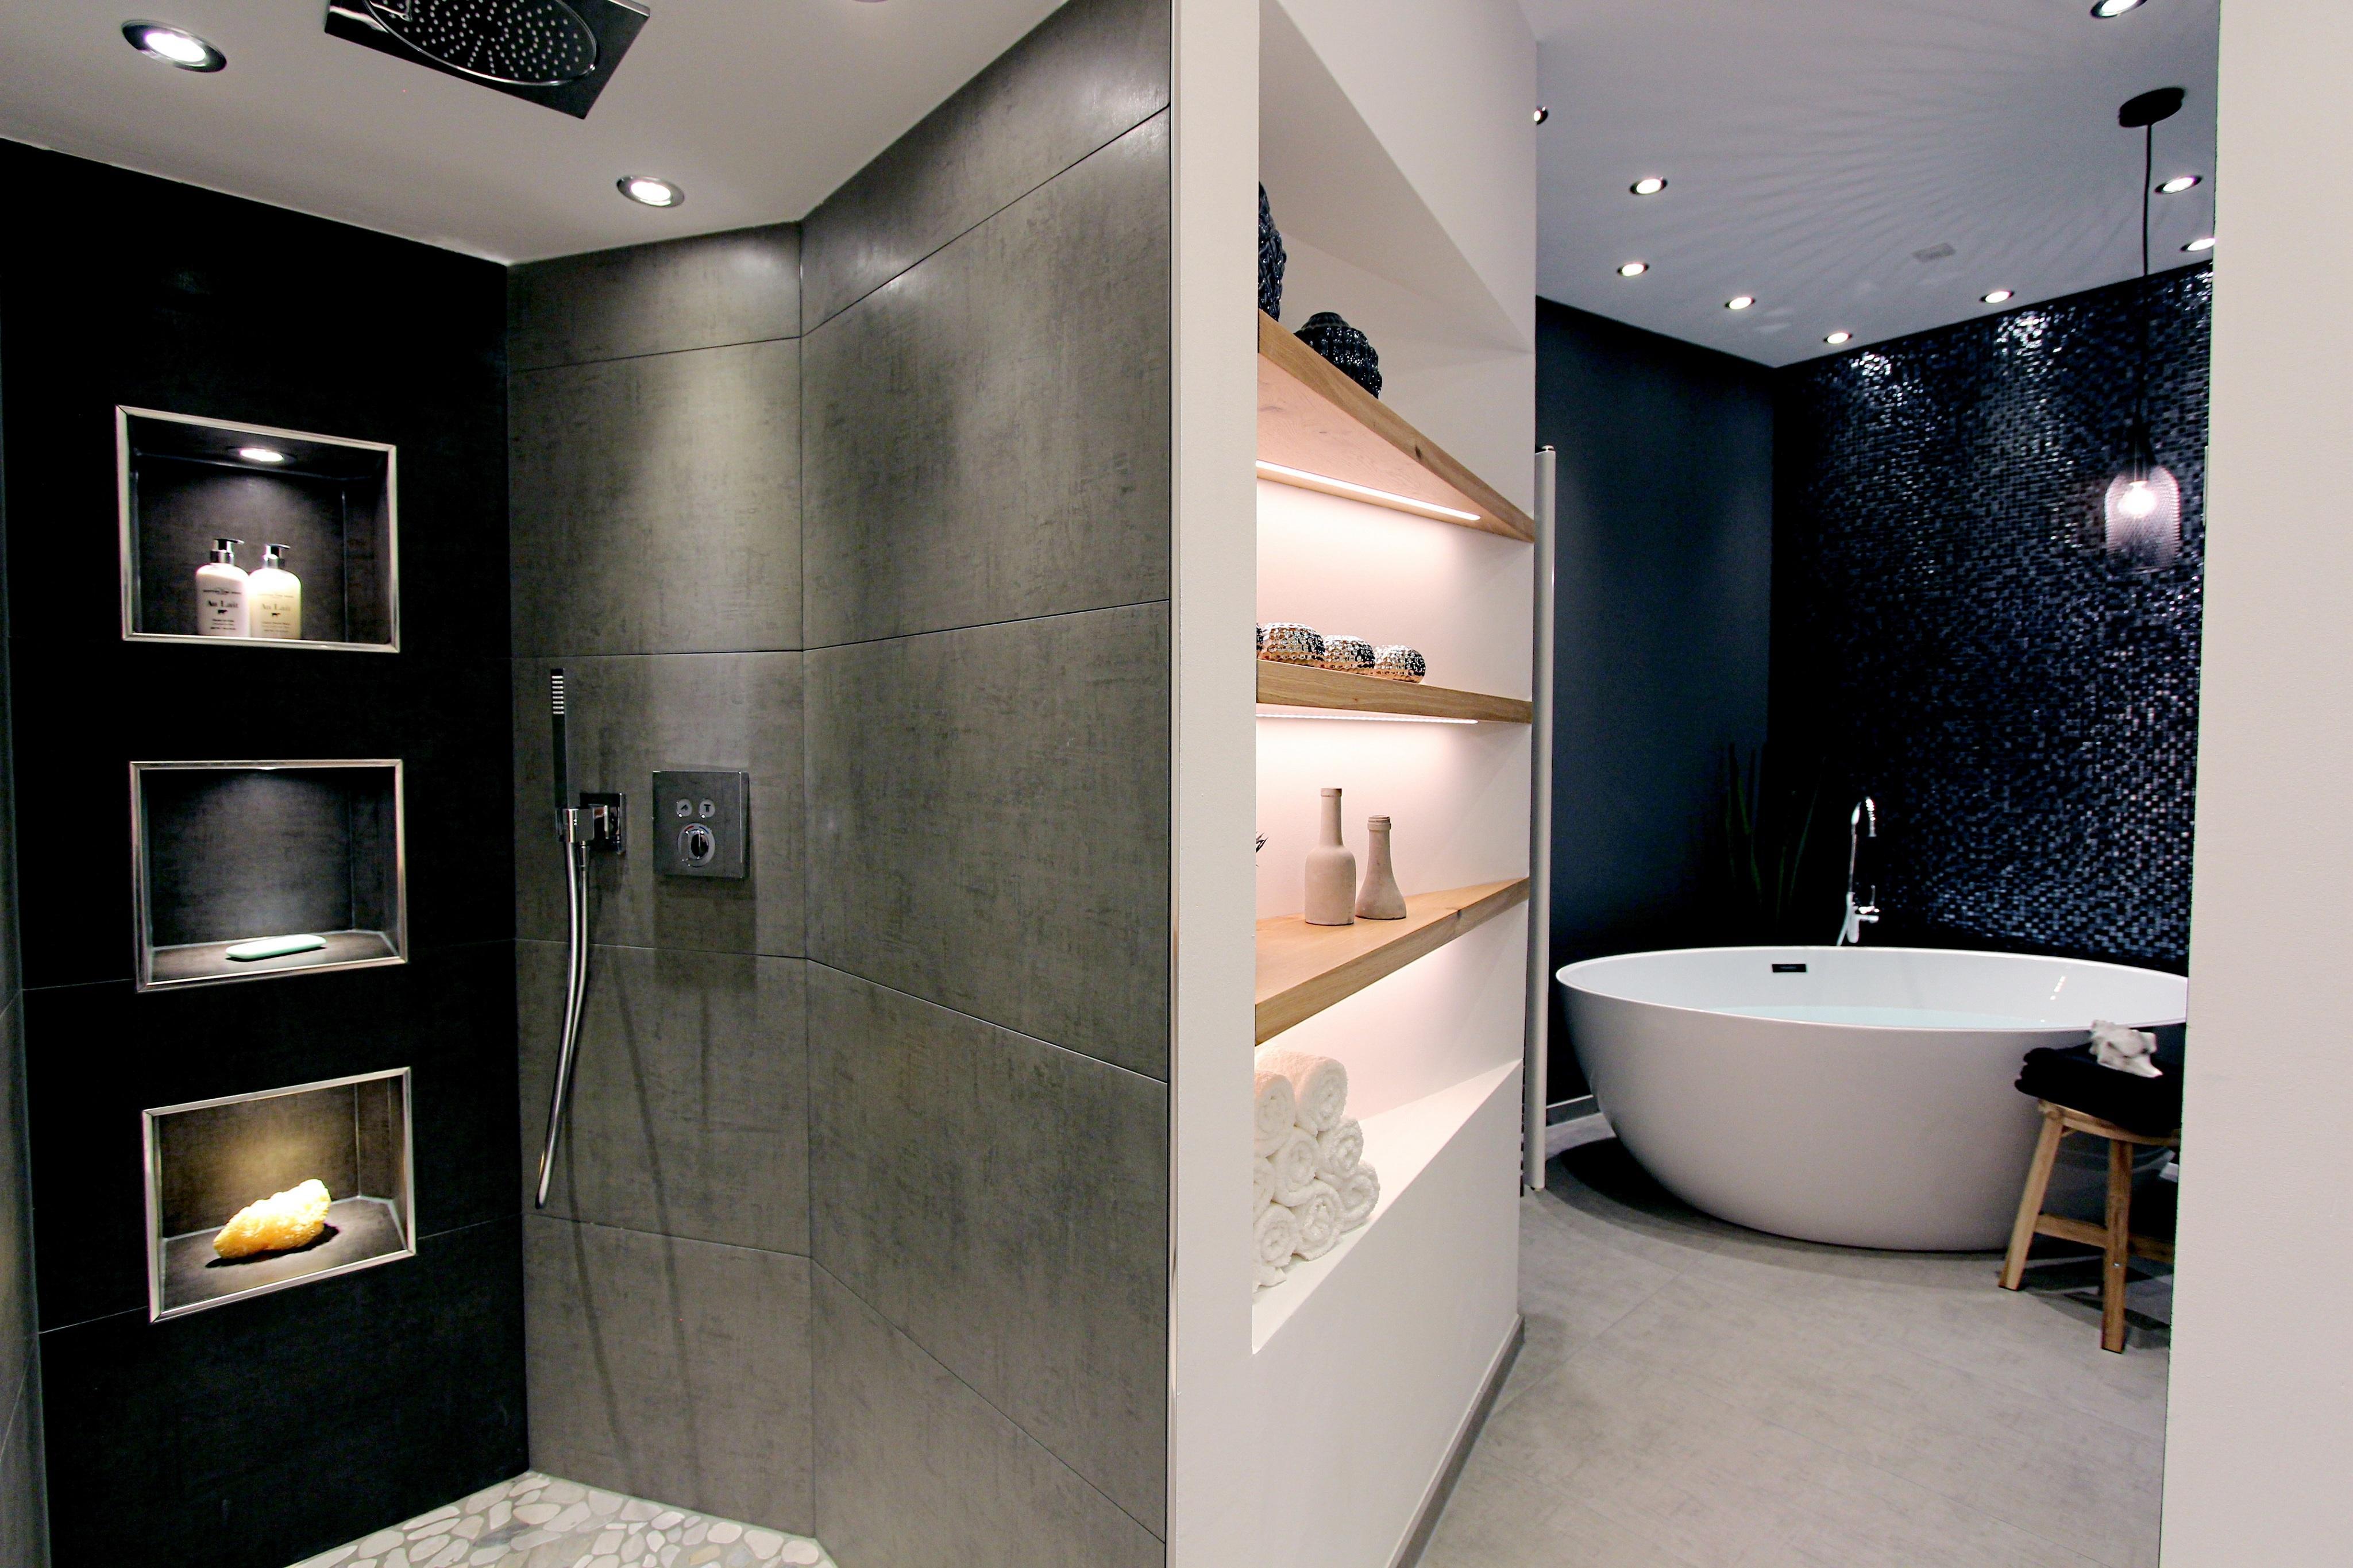 Badezimmer dusche ideen  Ebenerdige Dusche • Bilder & Ideen • COUCHstyle